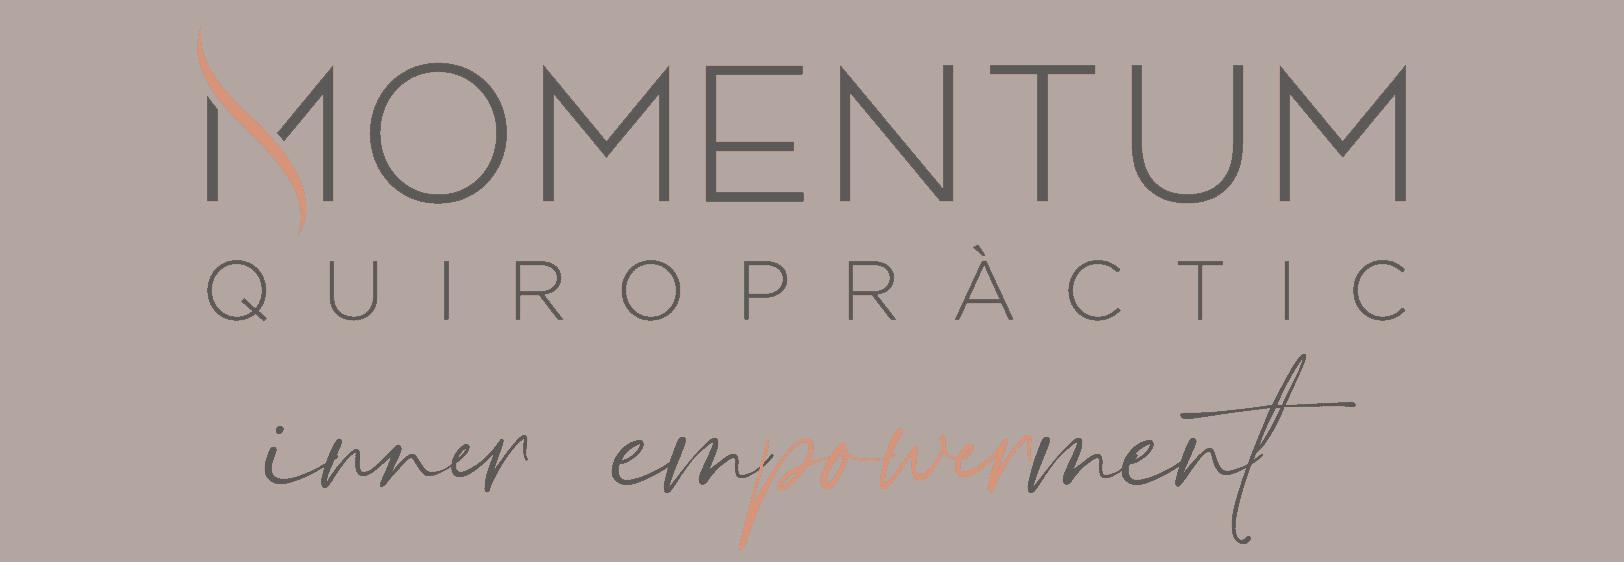 Momentum Quiropractic